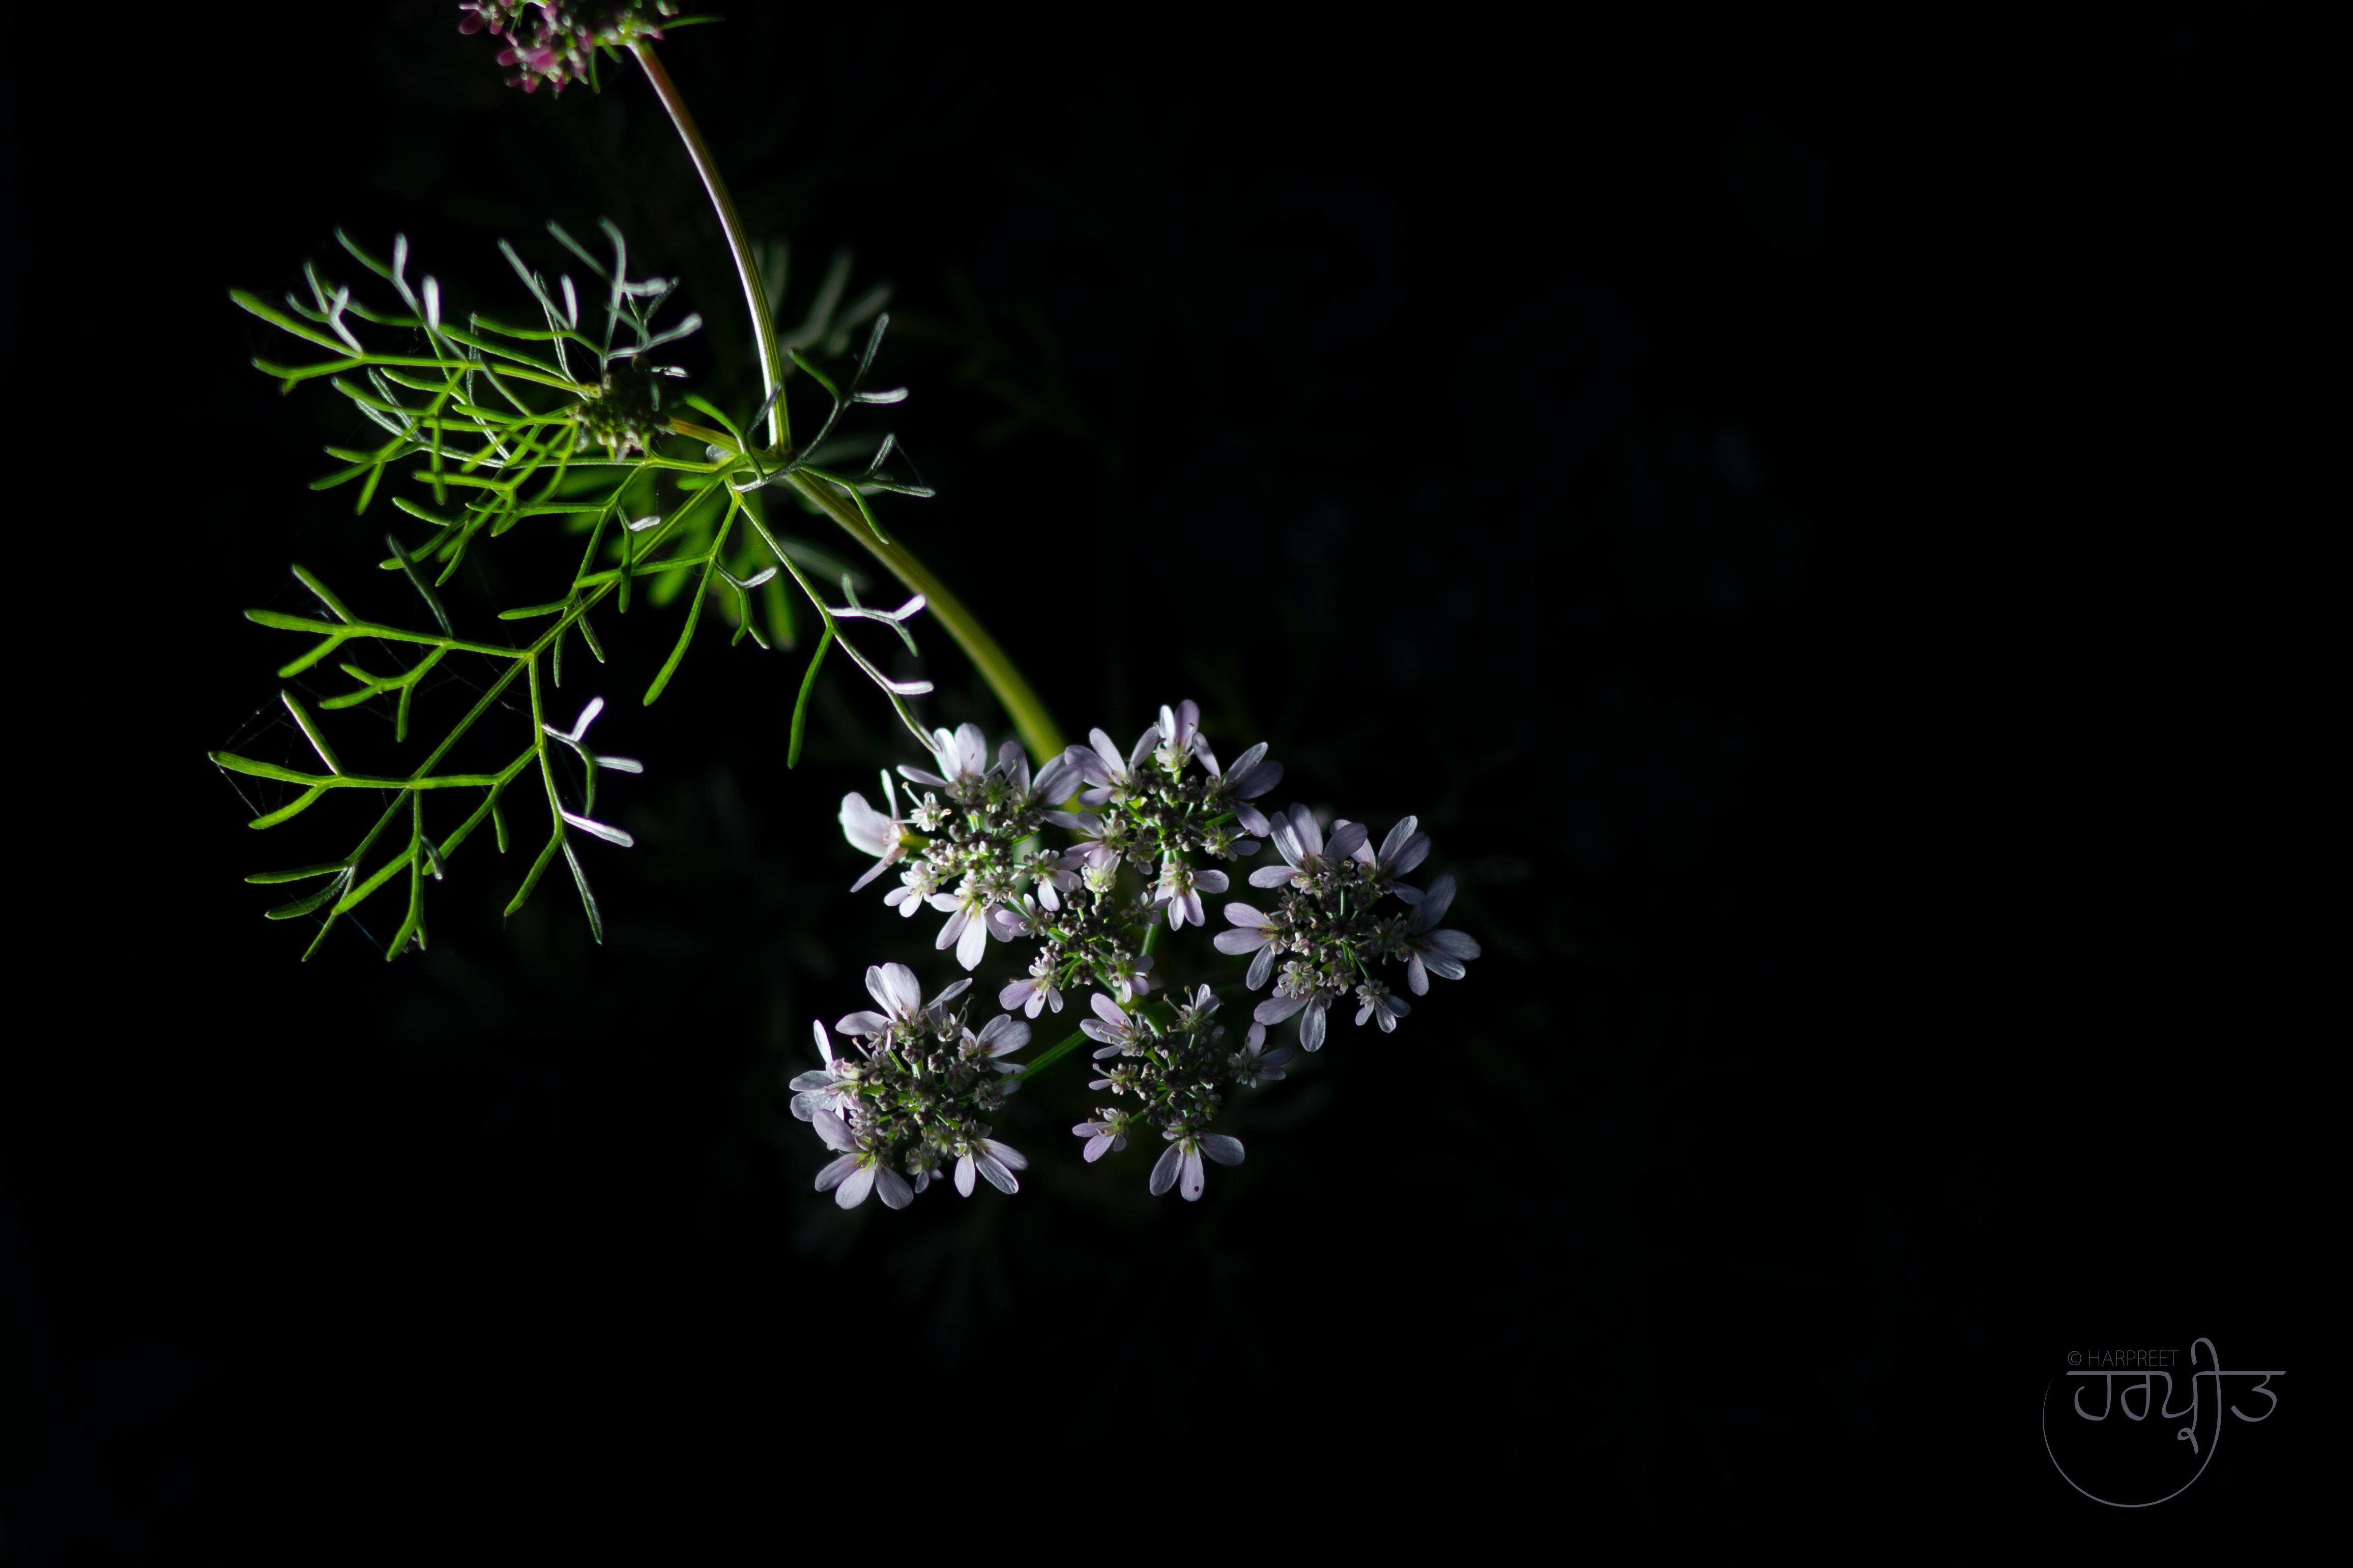 Menakjubkan 16 Gambar Bunga Latar Belakang Hitam Gambar Bunga HD